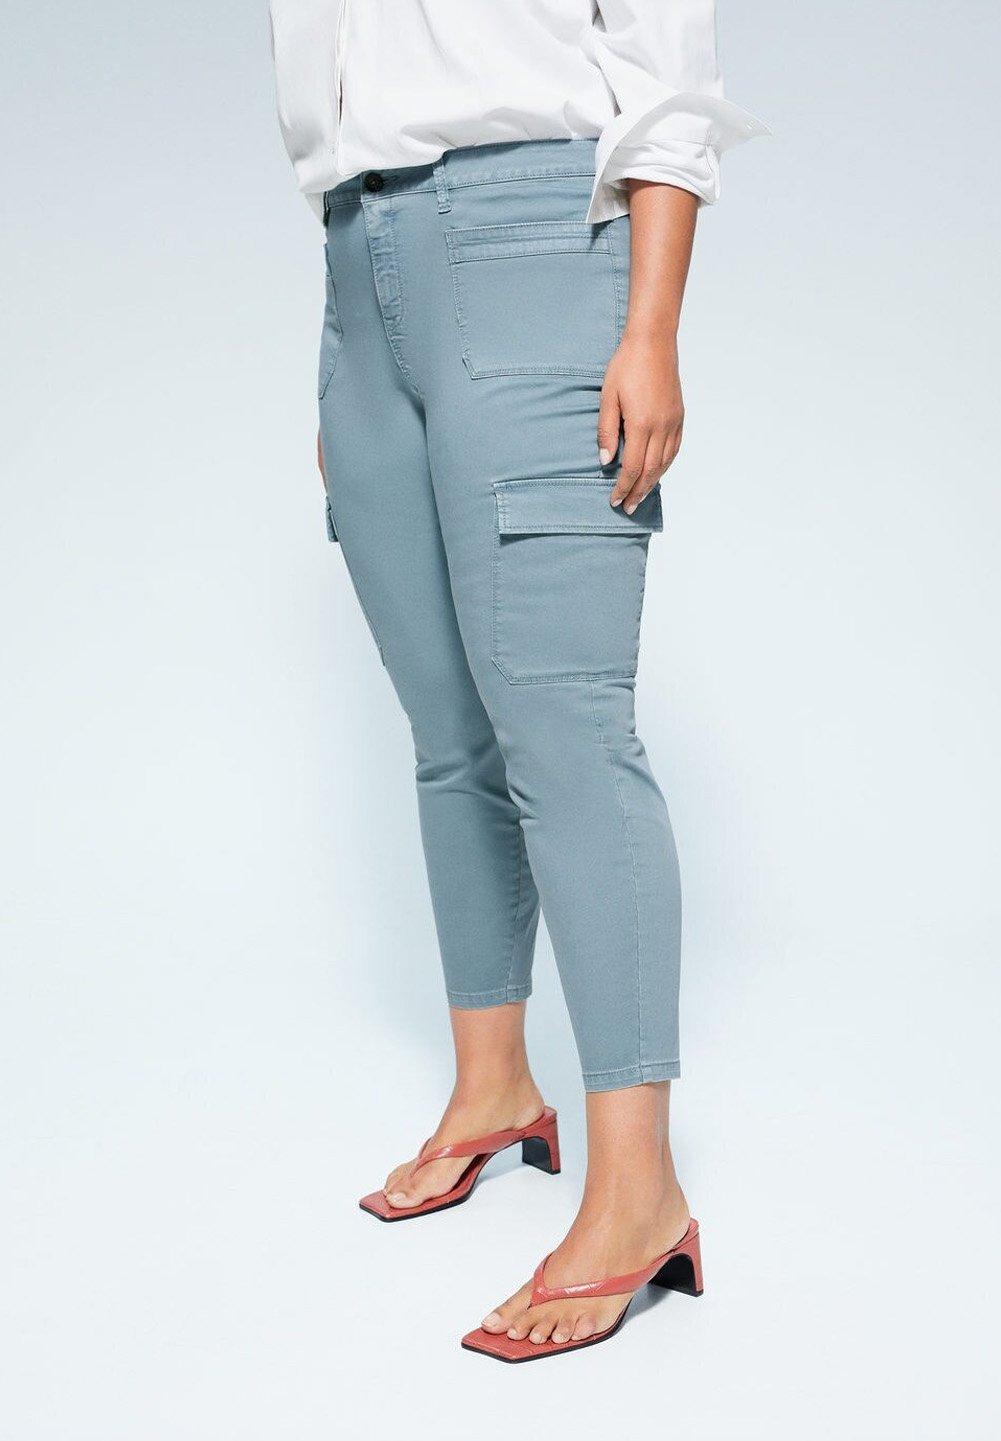 Violeta By Mango Patxi - Jeans Skinny Fit Aquamarine UK